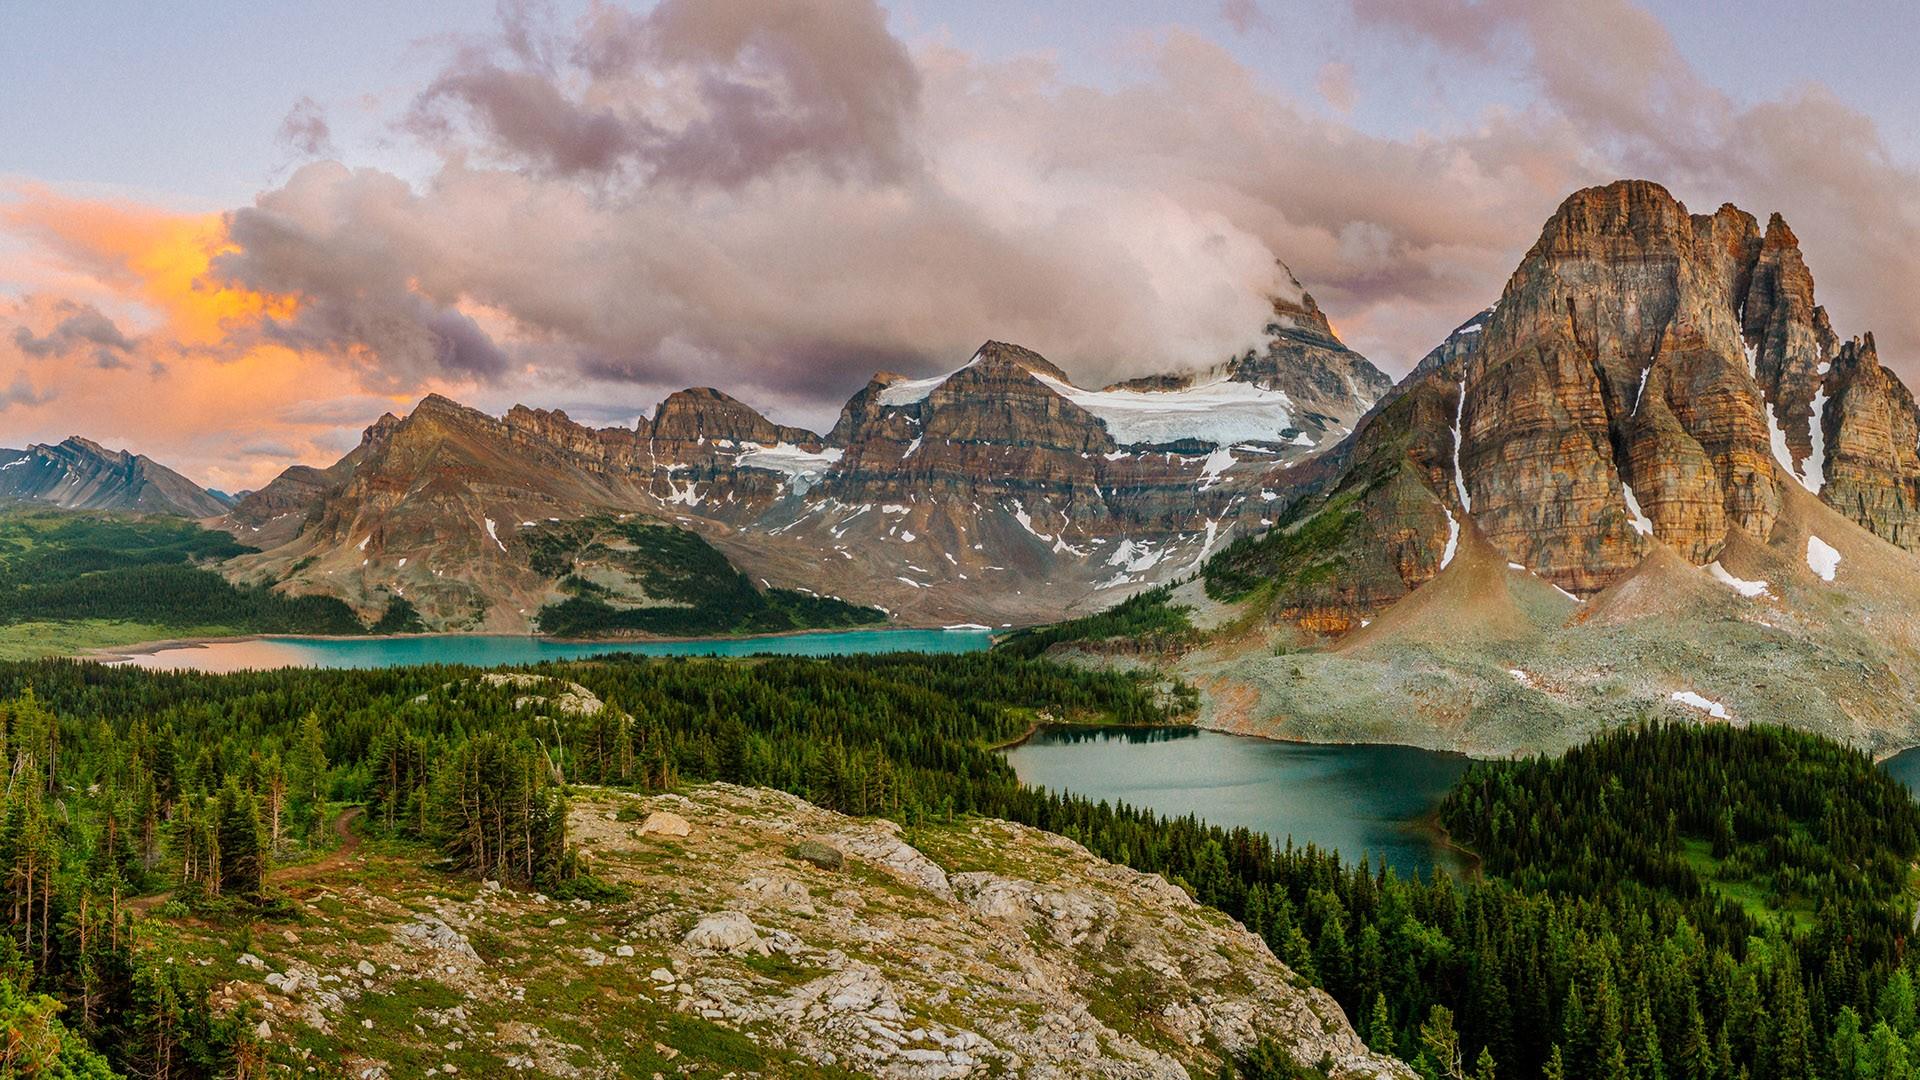 Assiniboine, Canada 1920x1080.jpg